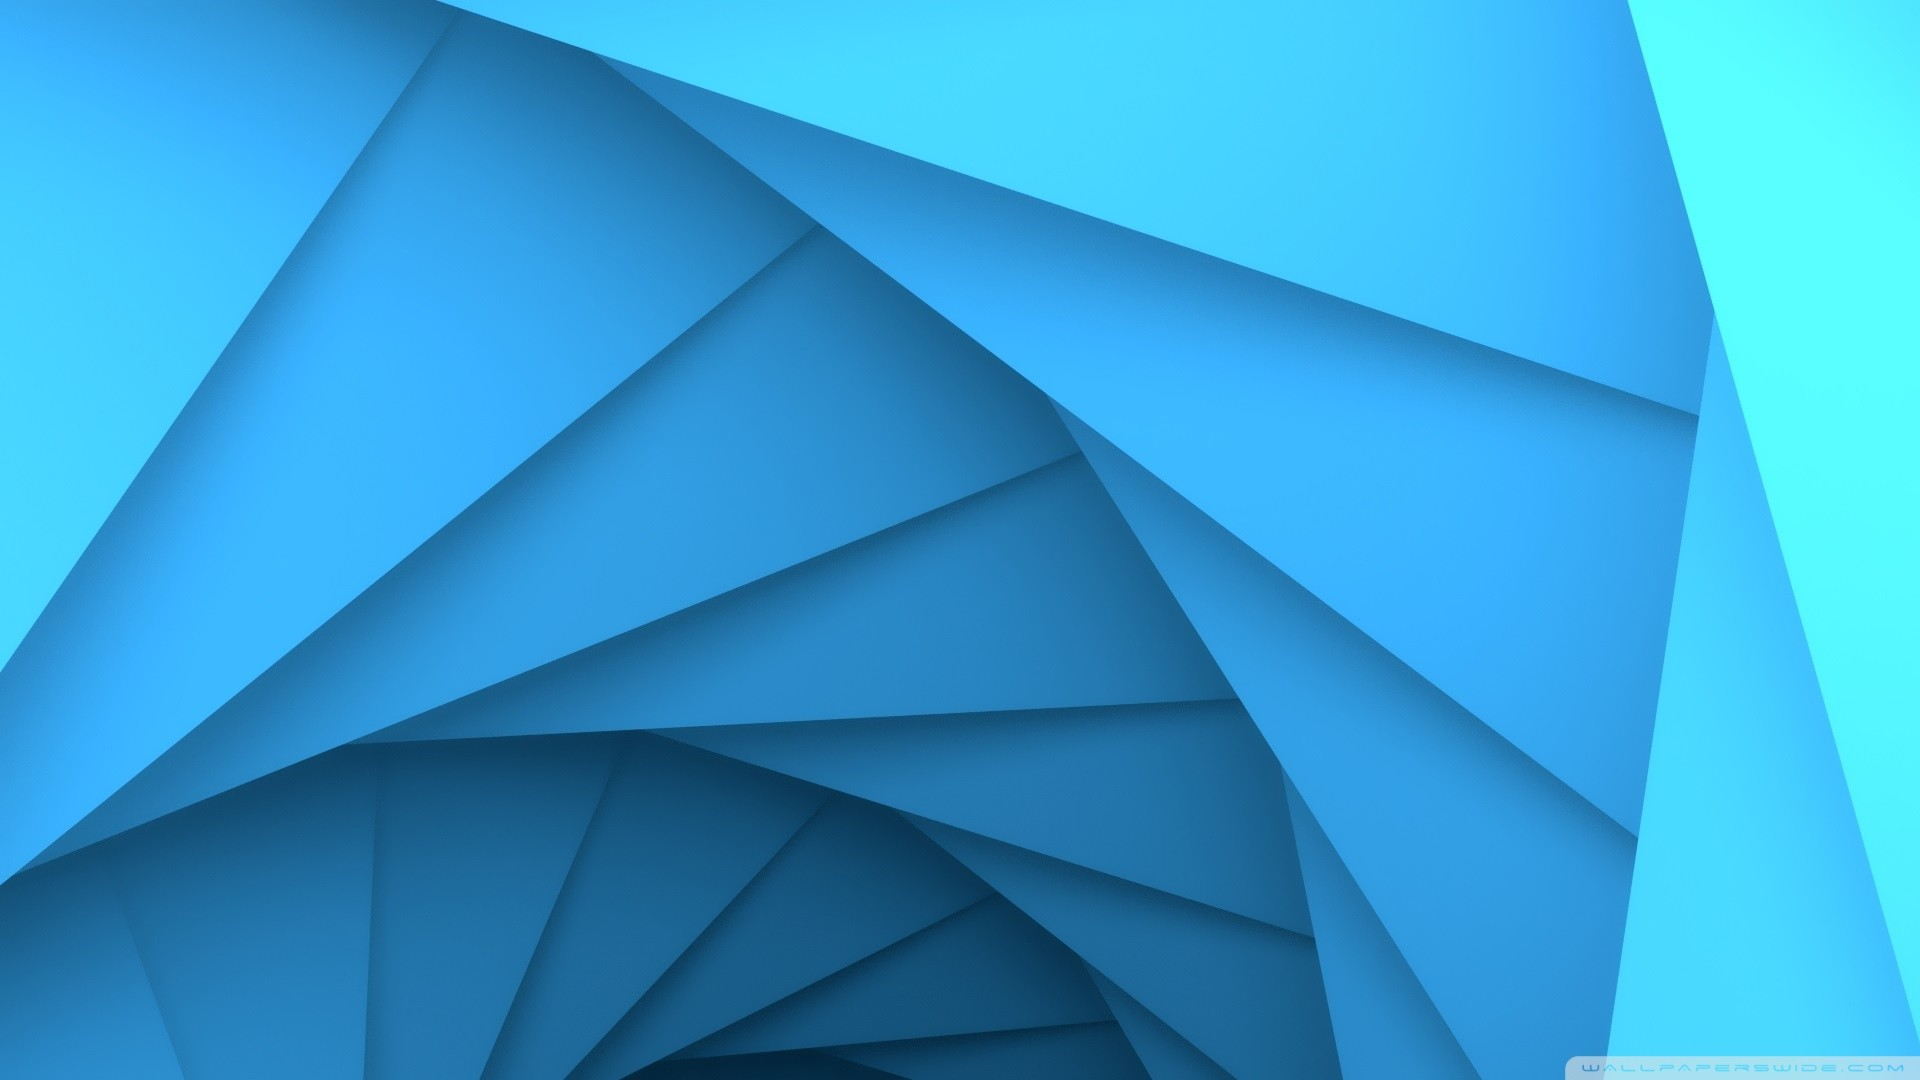 HD Geometric Wallpaper (82+ images)